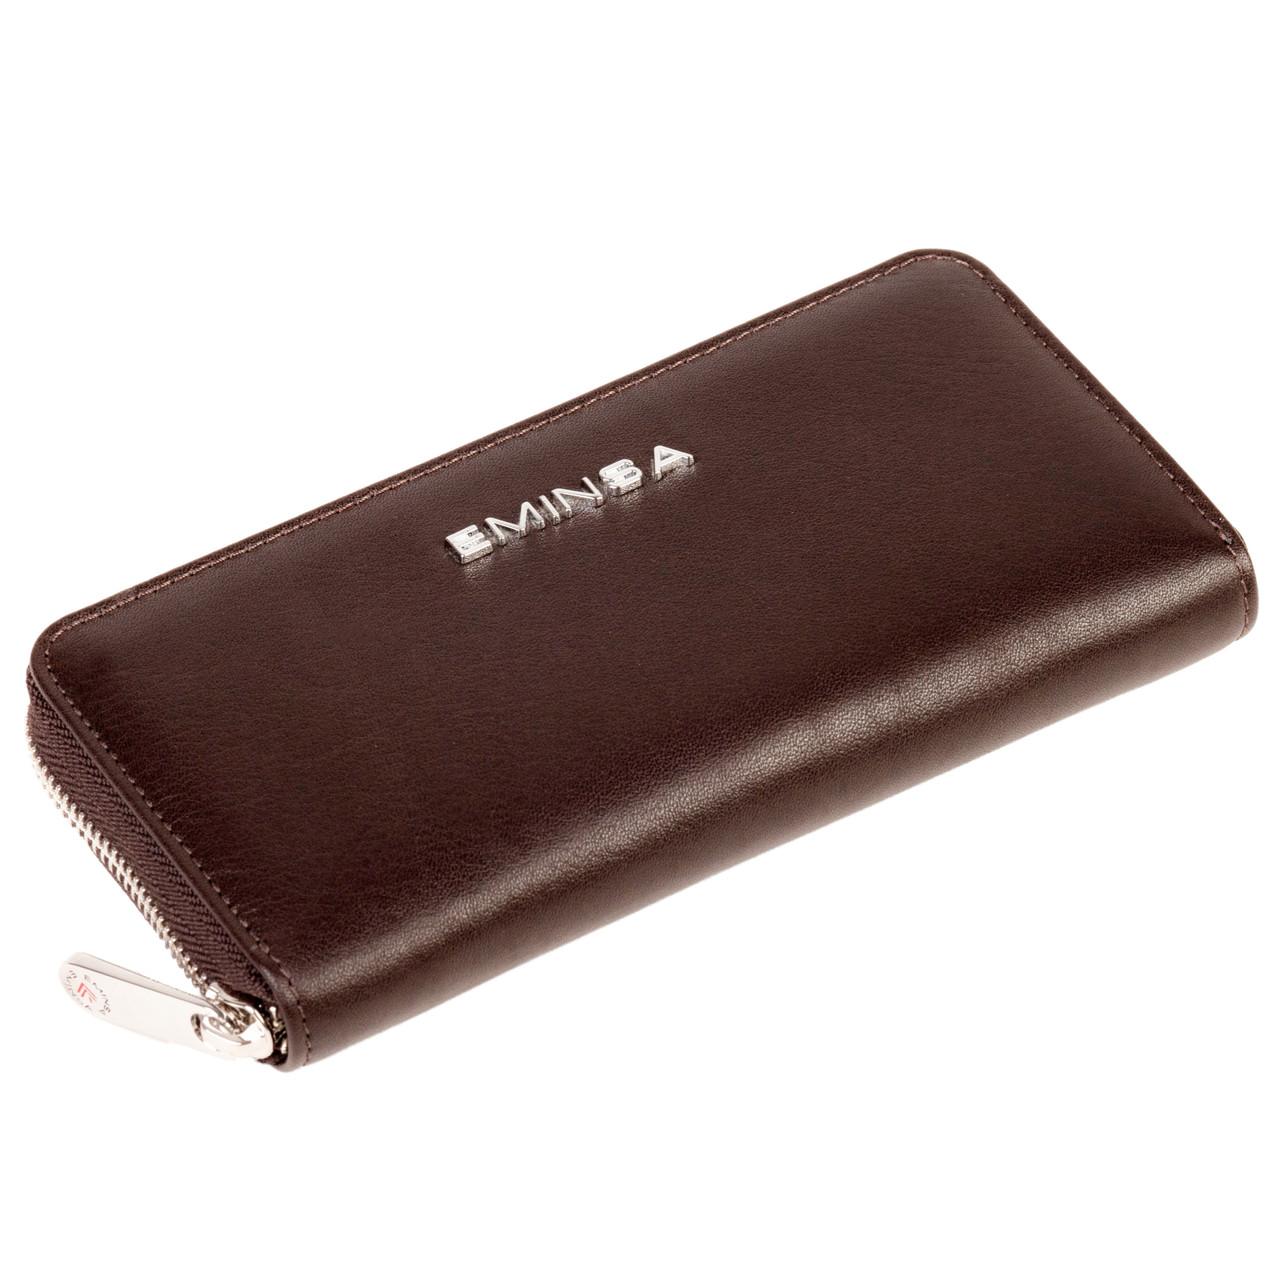 Женский кошелек кожаный коричневый Eminsa 2036-12-3